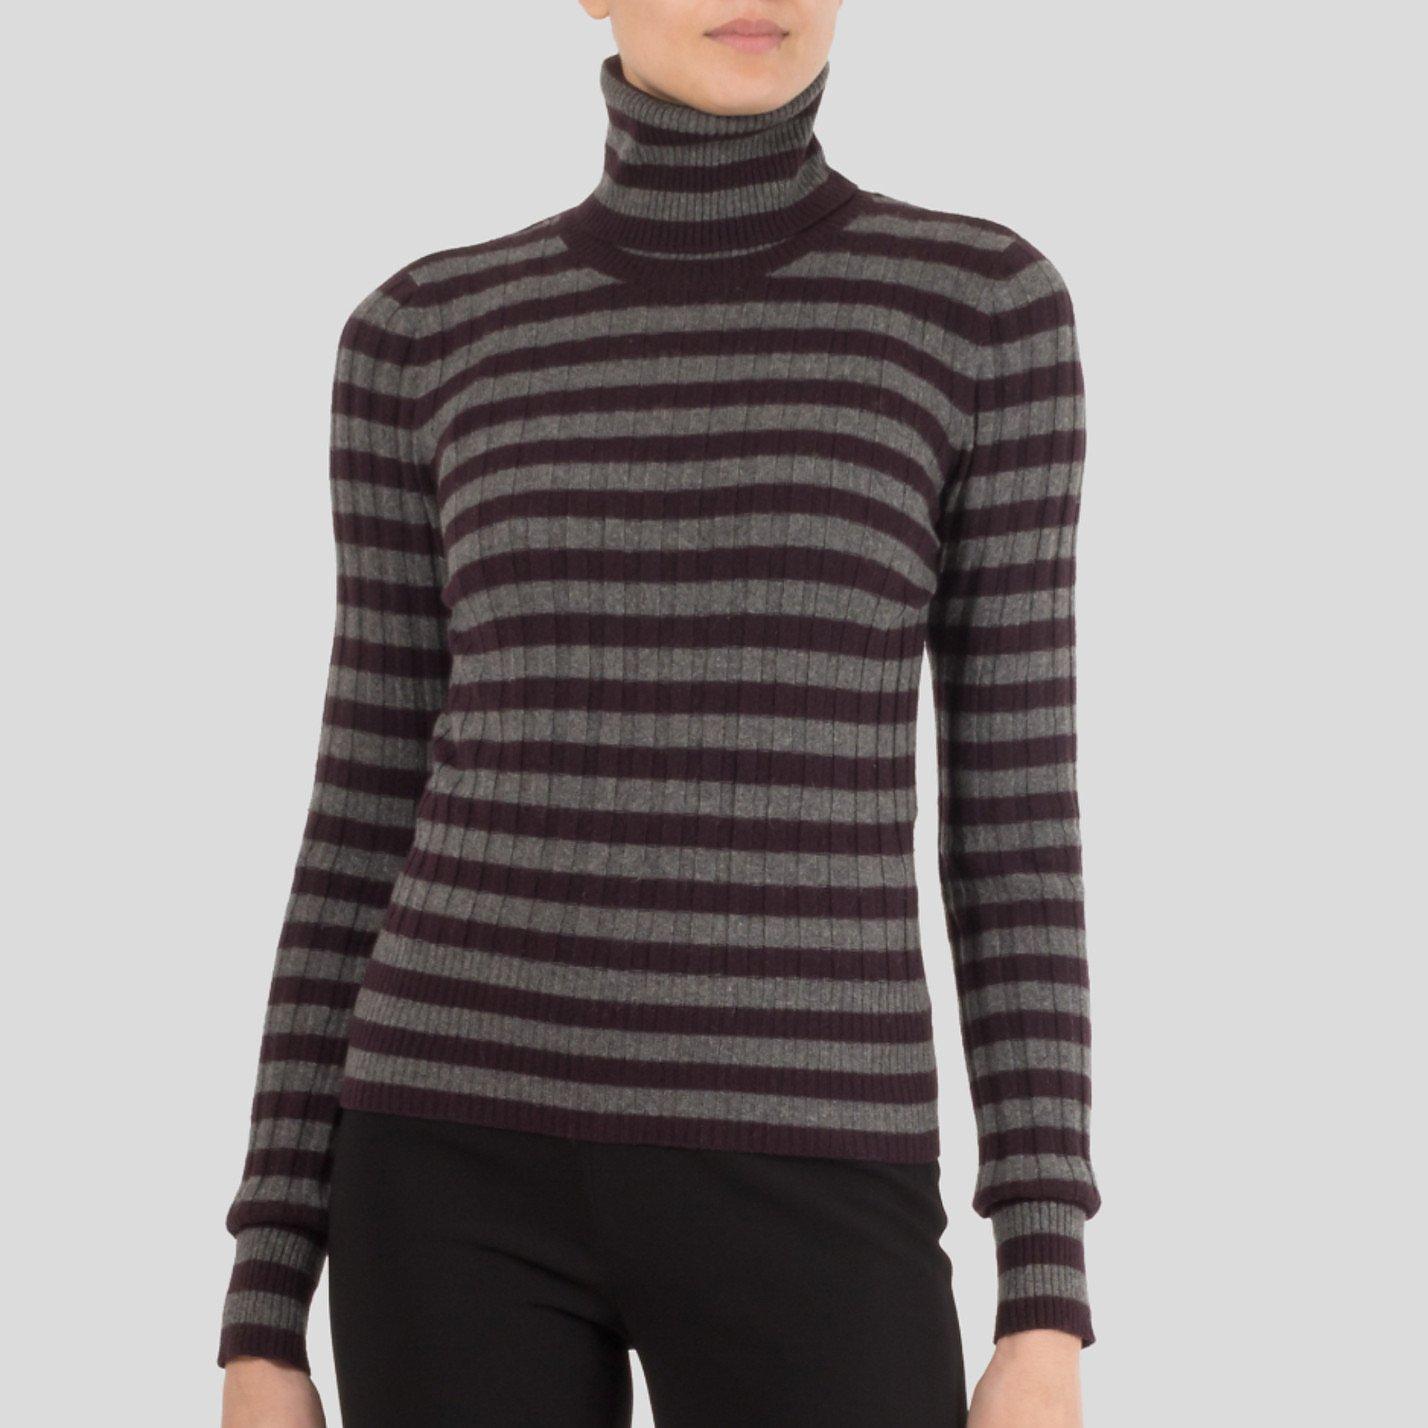 DOLCE & GABBANA Striped Cashmere Turtle Neck Sweater